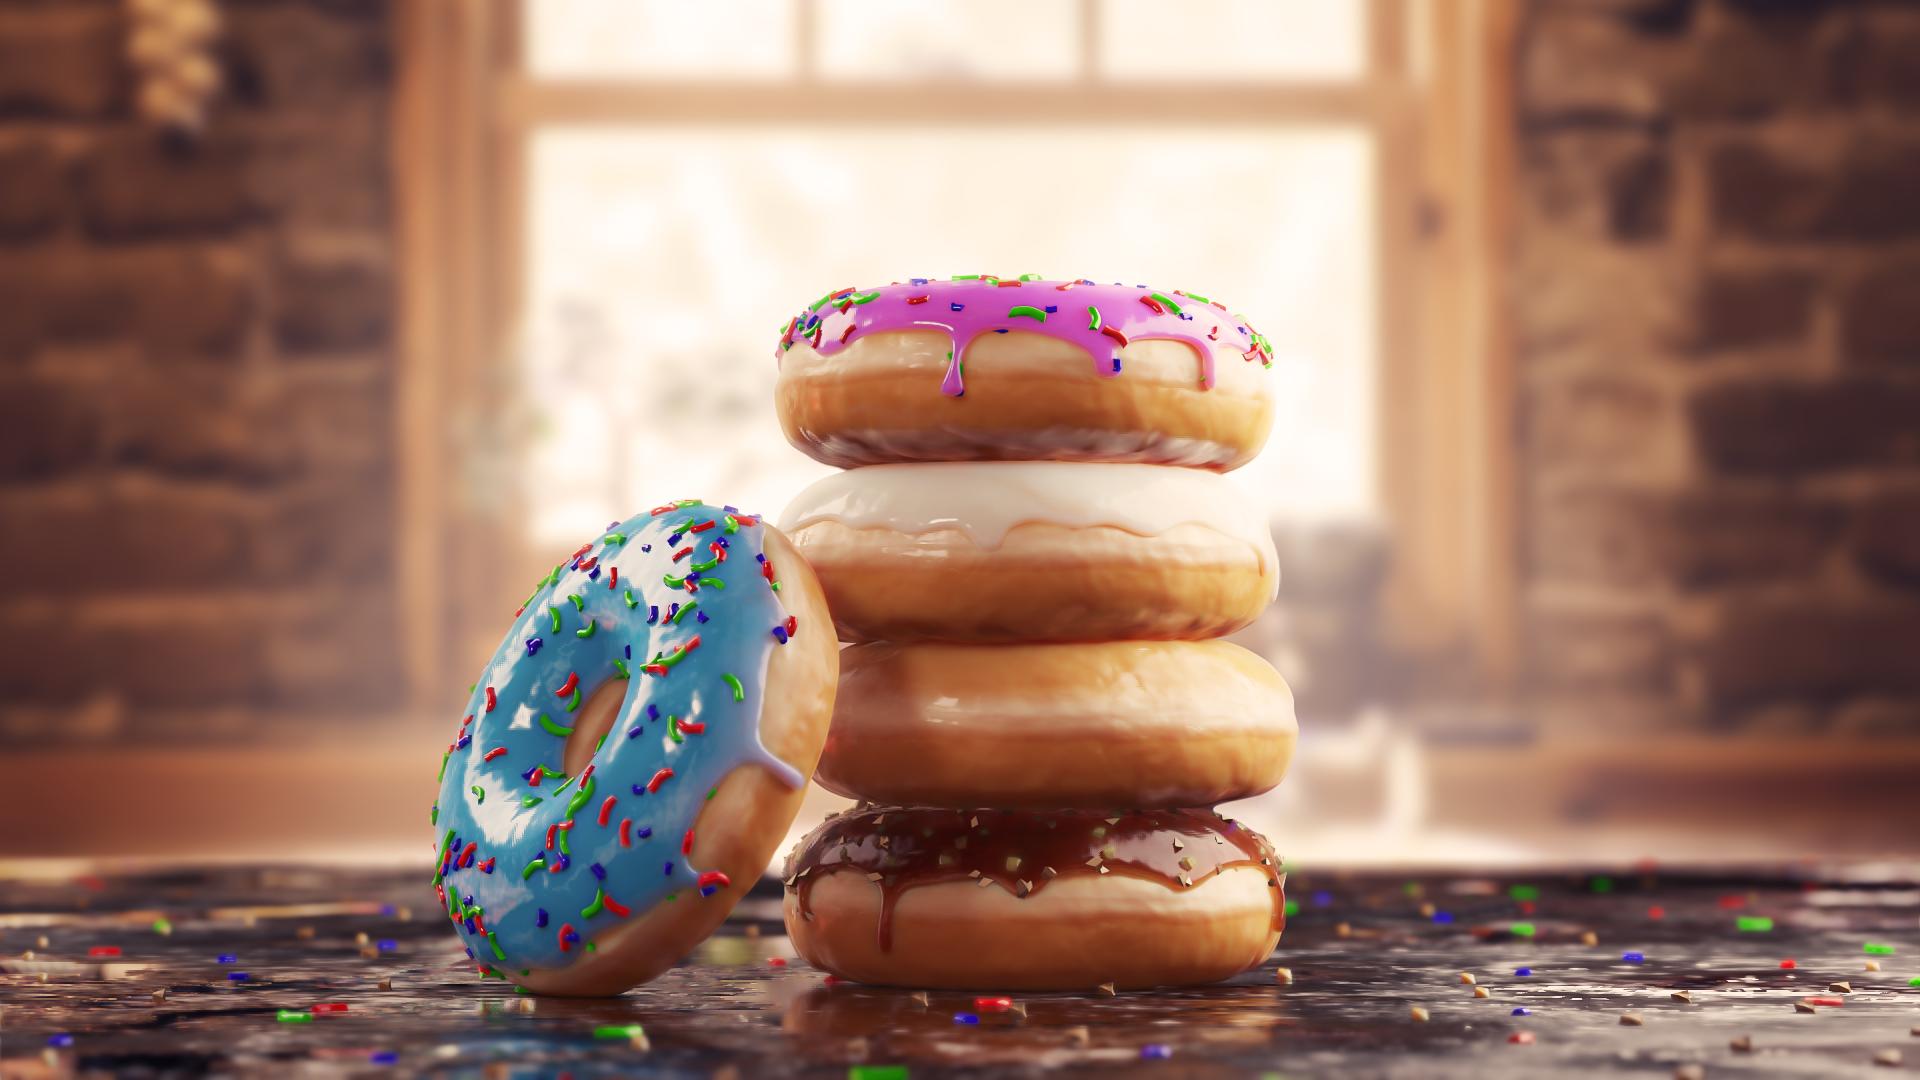 Model Donuts with Blender 2 8 and EEVEE - BlenderNation